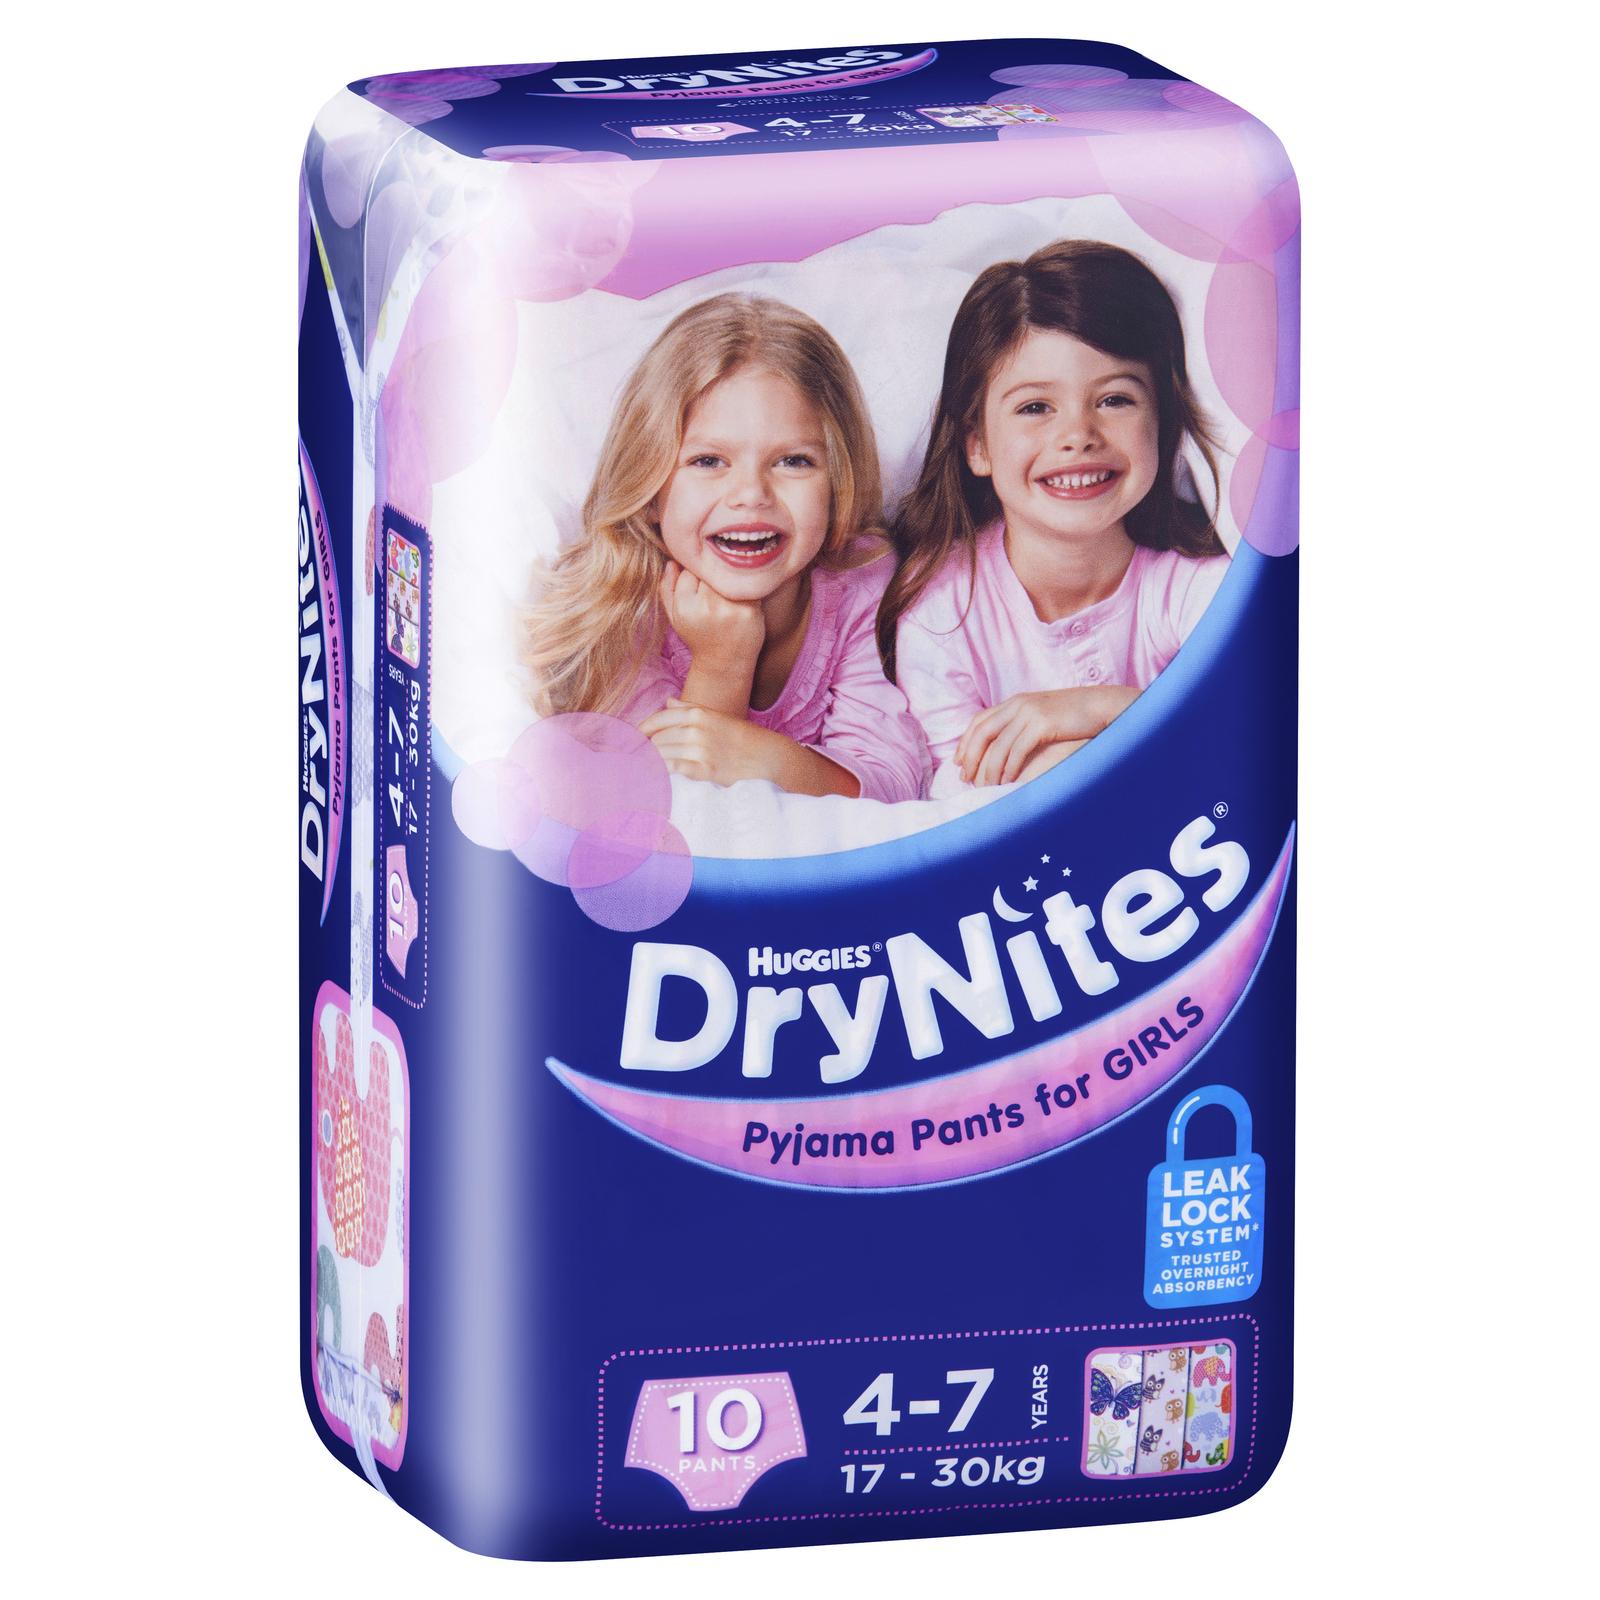 Huggies DryNites Pyjama Pants - 4-7 Year Girl 17-30 kg (10) image